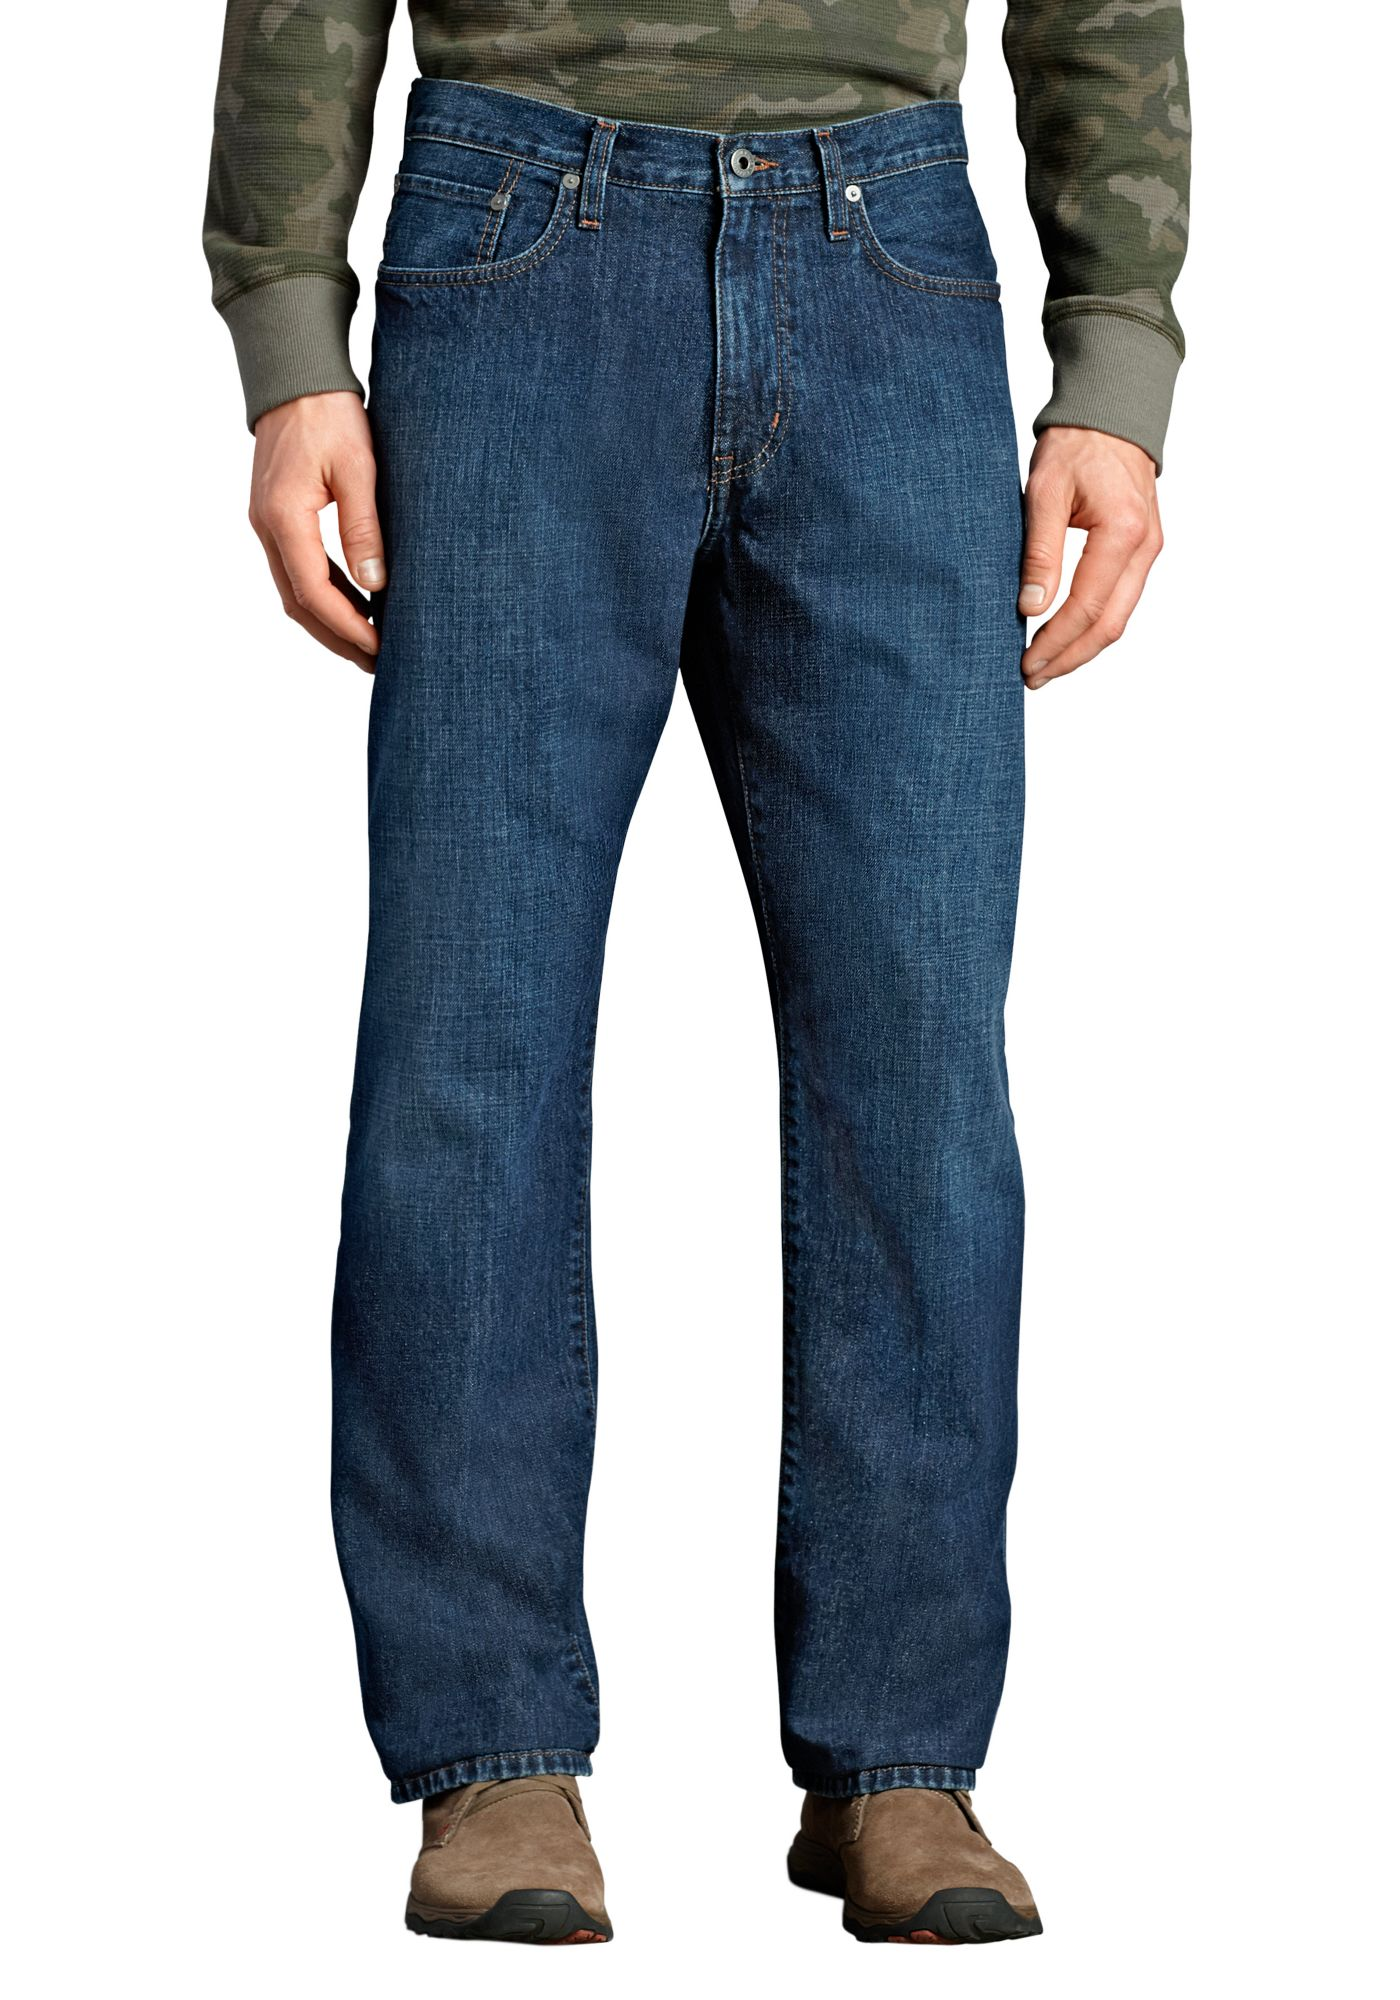 EDDIE BAUER Eddie Bauer Authentic Jeans-Relaxed Fit